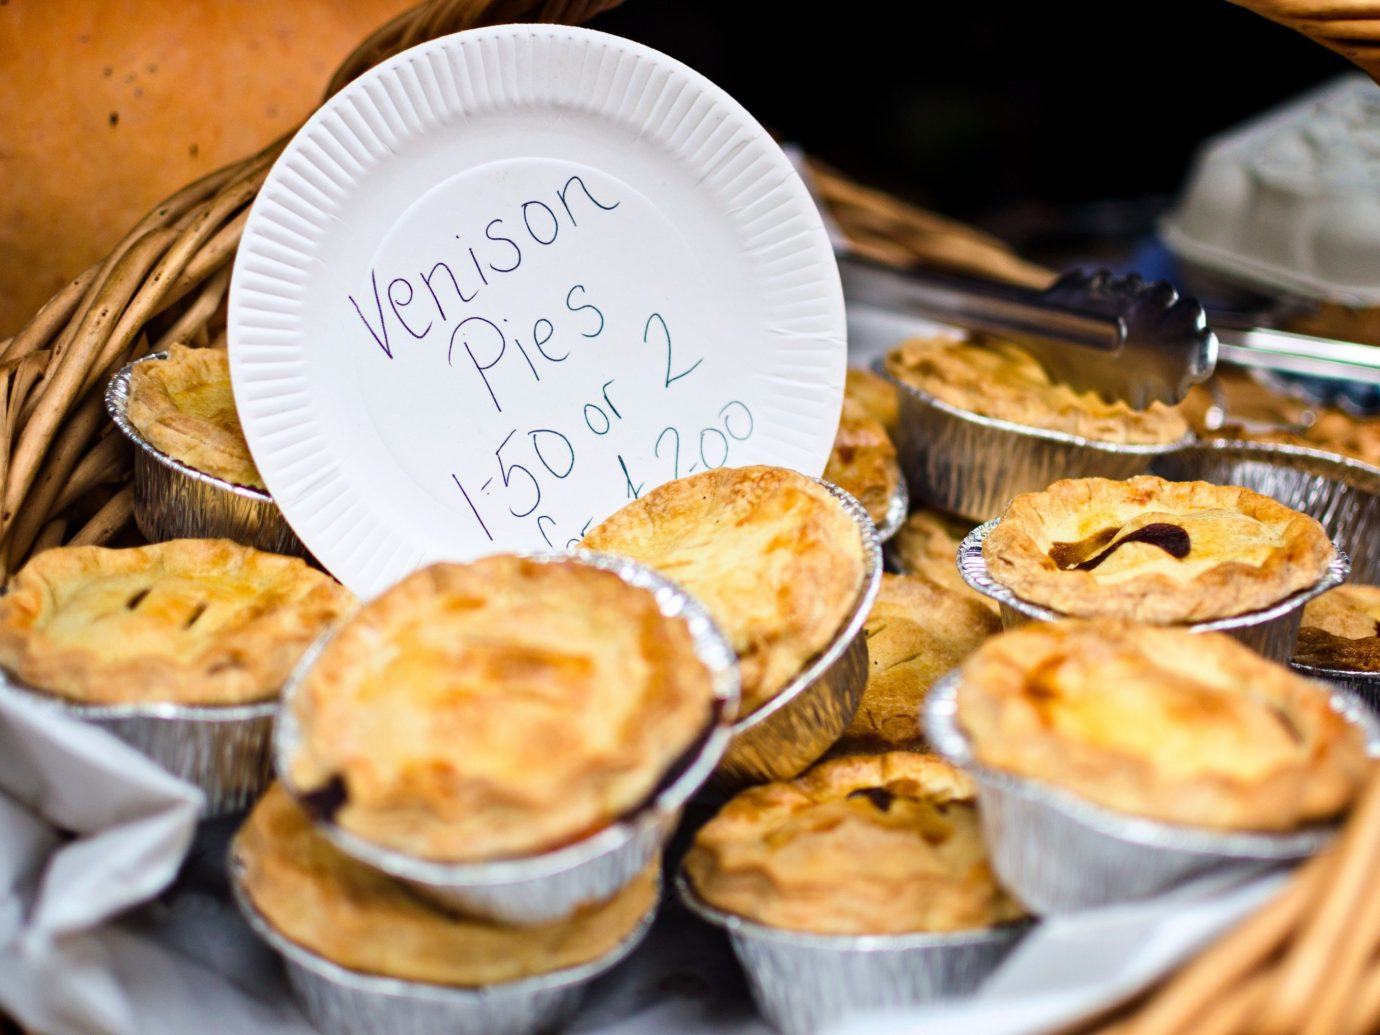 Outdoors + Adventure food plate dish indoor meal bowl breakfast dessert baked goods baking brunch bakery produce pot pie